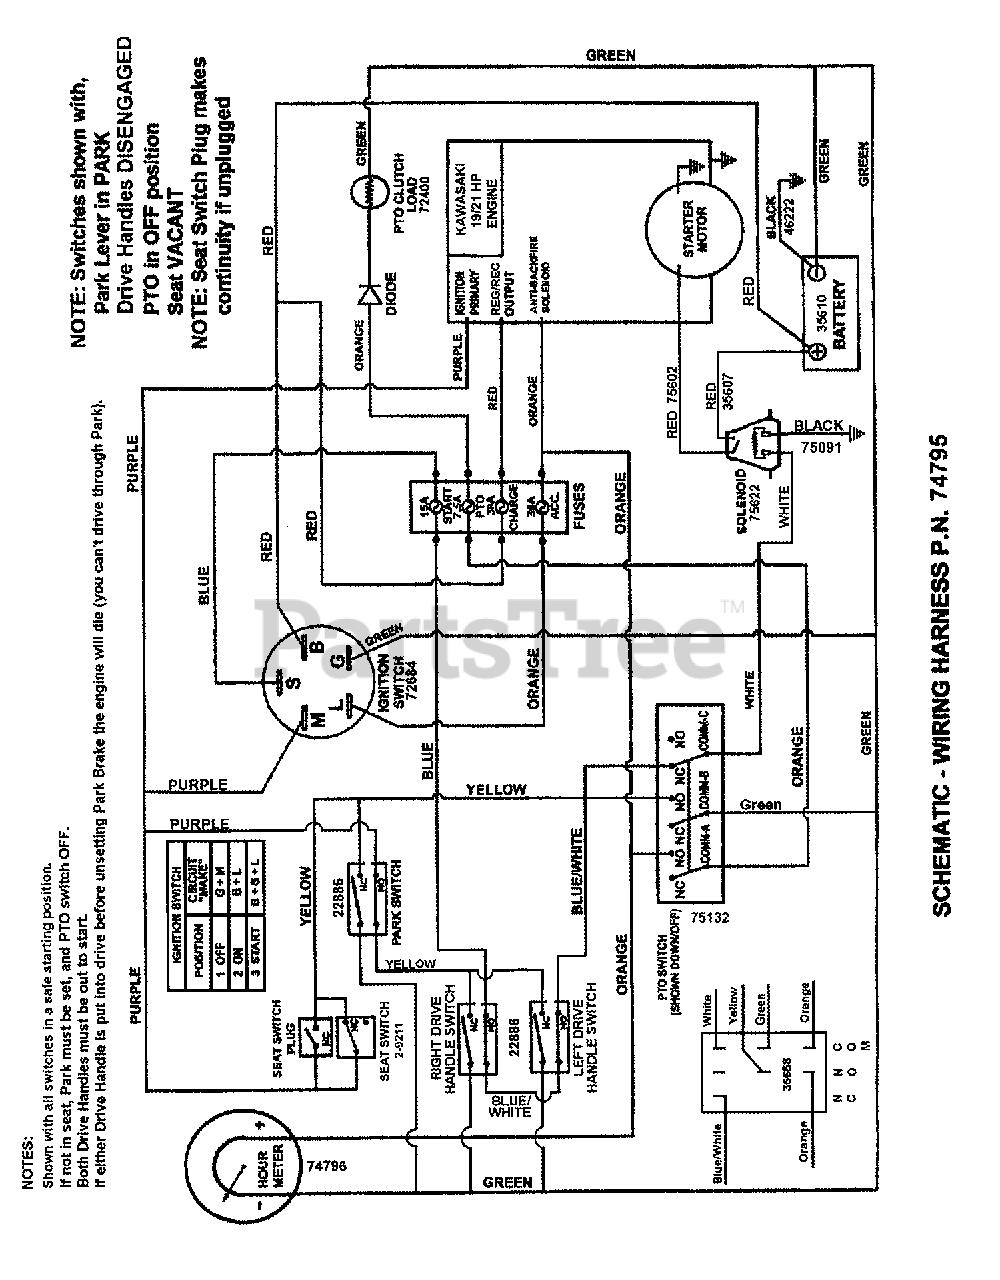 Wiring Manual PDF: 19 Hp Kawasaki Engine Wire Diagram